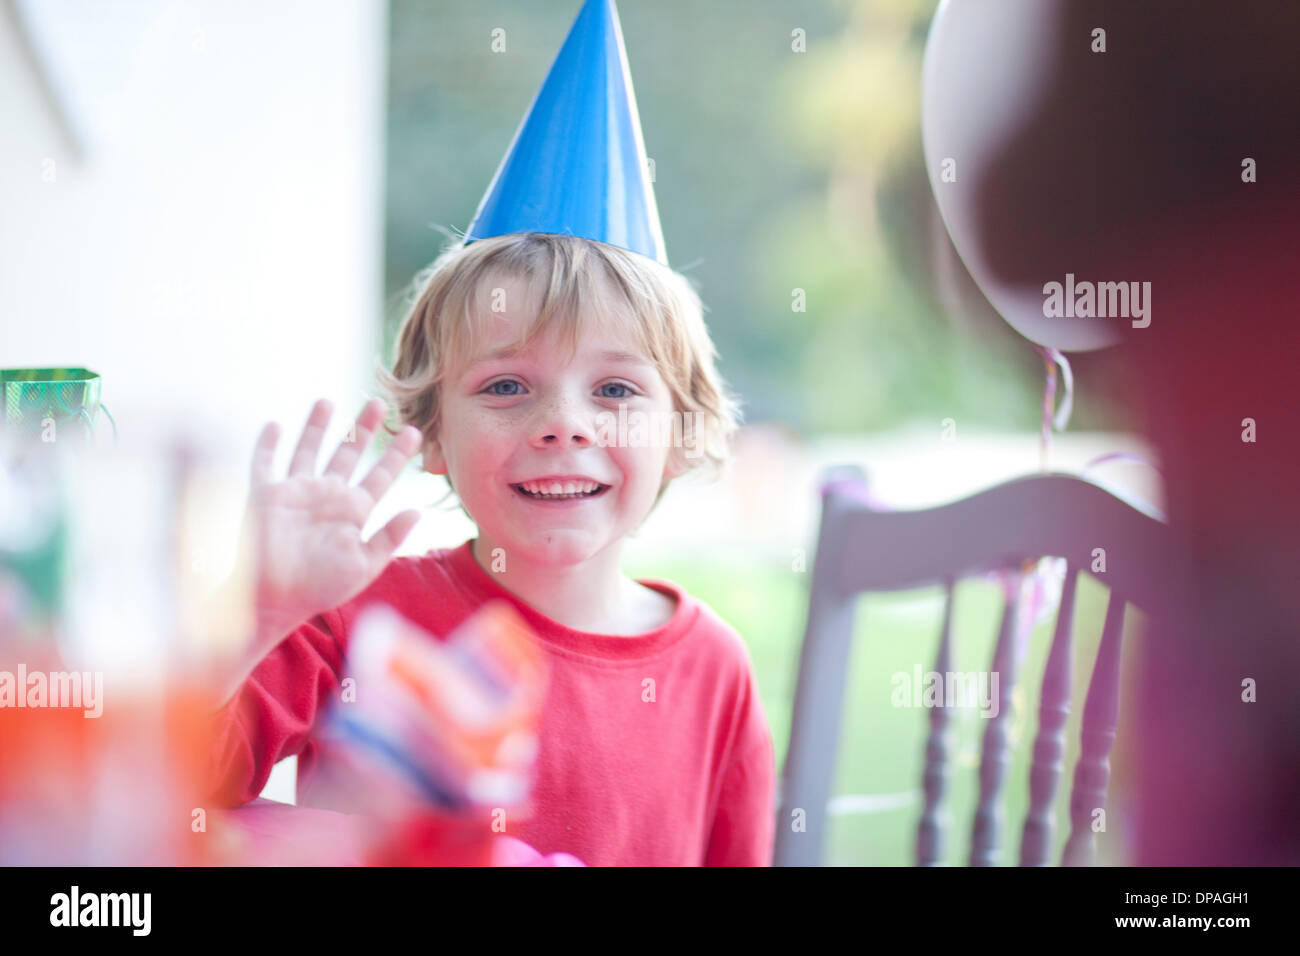 Young boy waving at birthday party - Stock Image